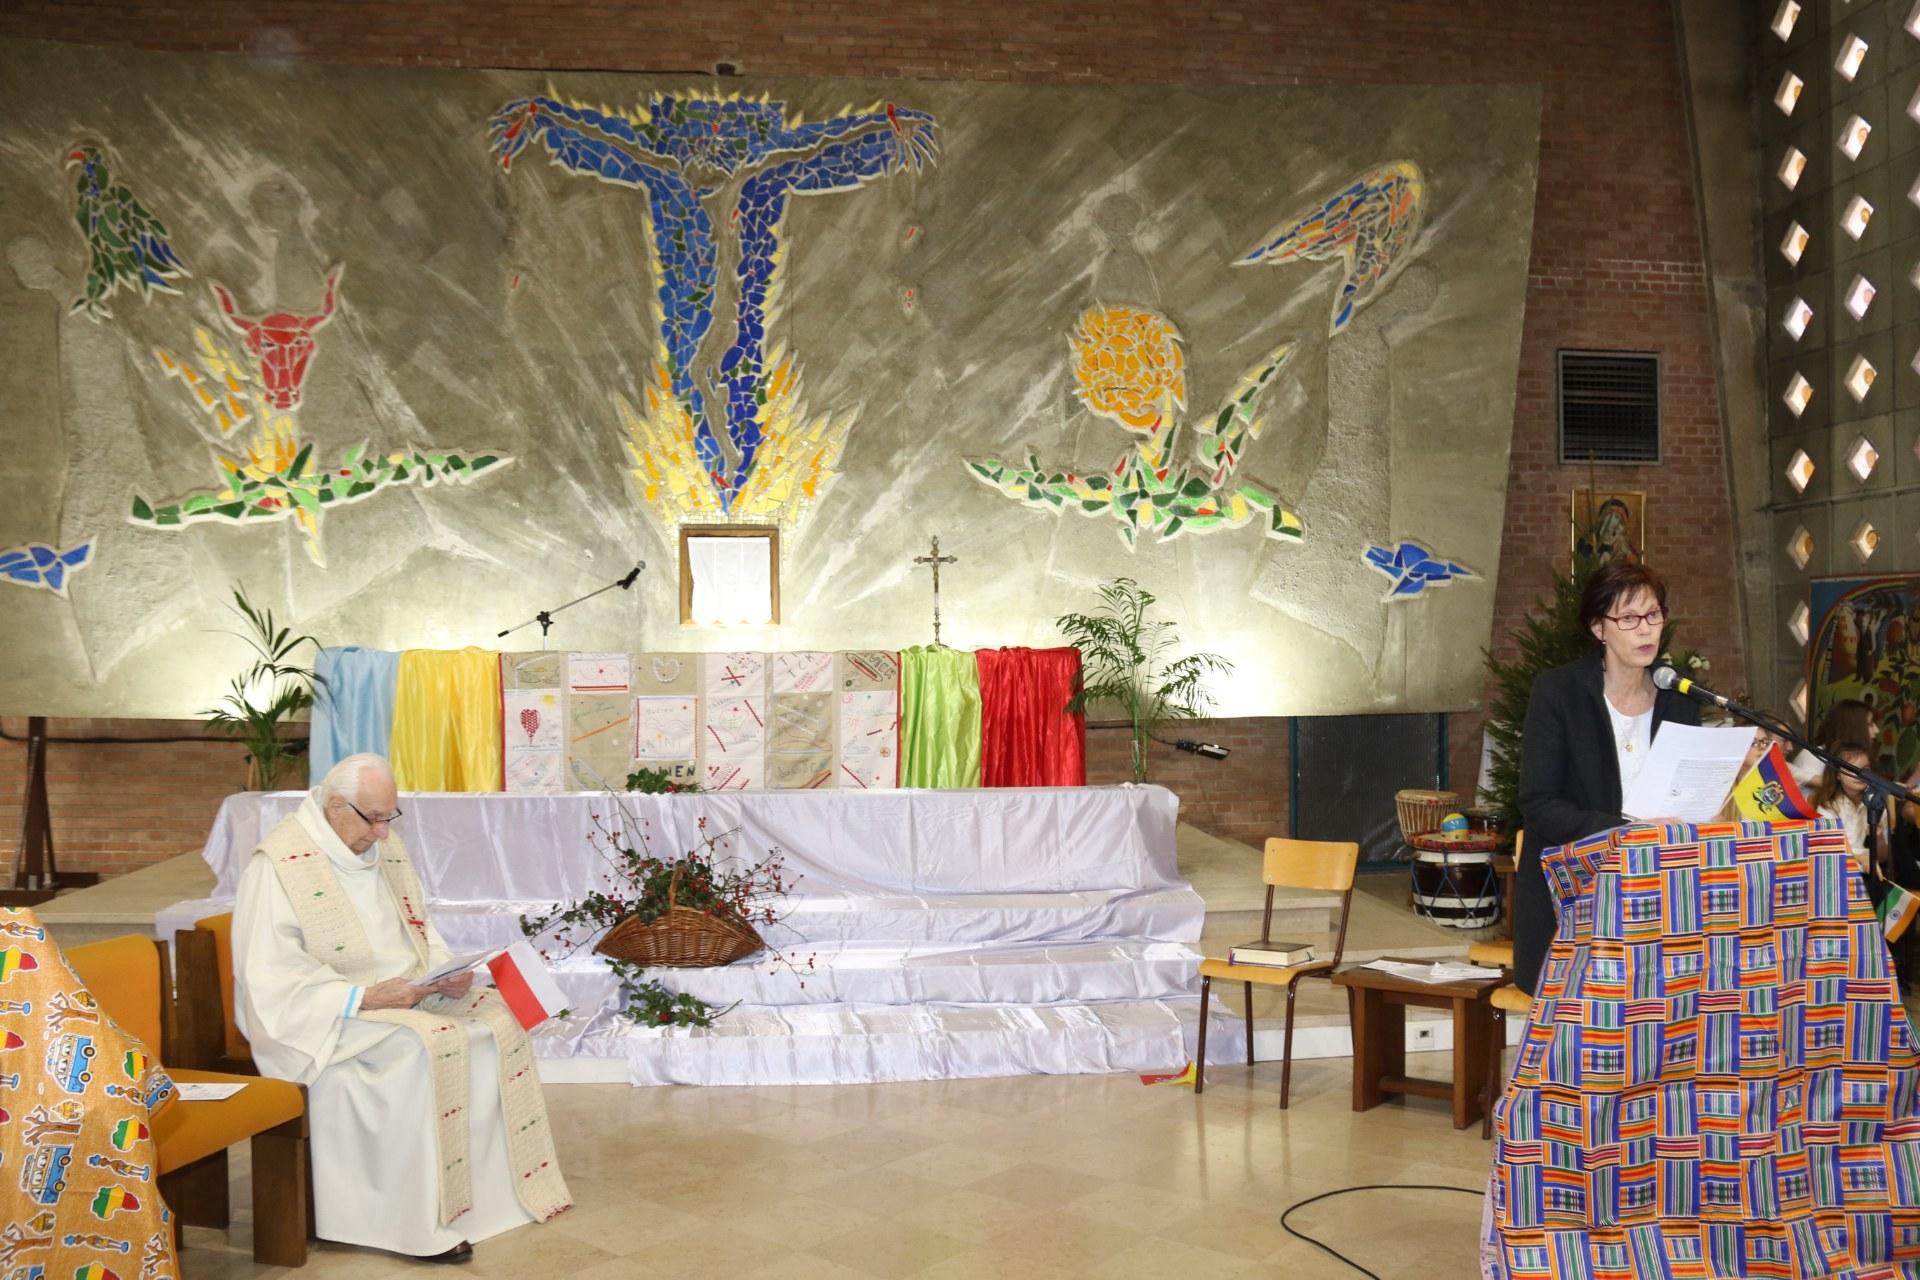 Messe des Nations